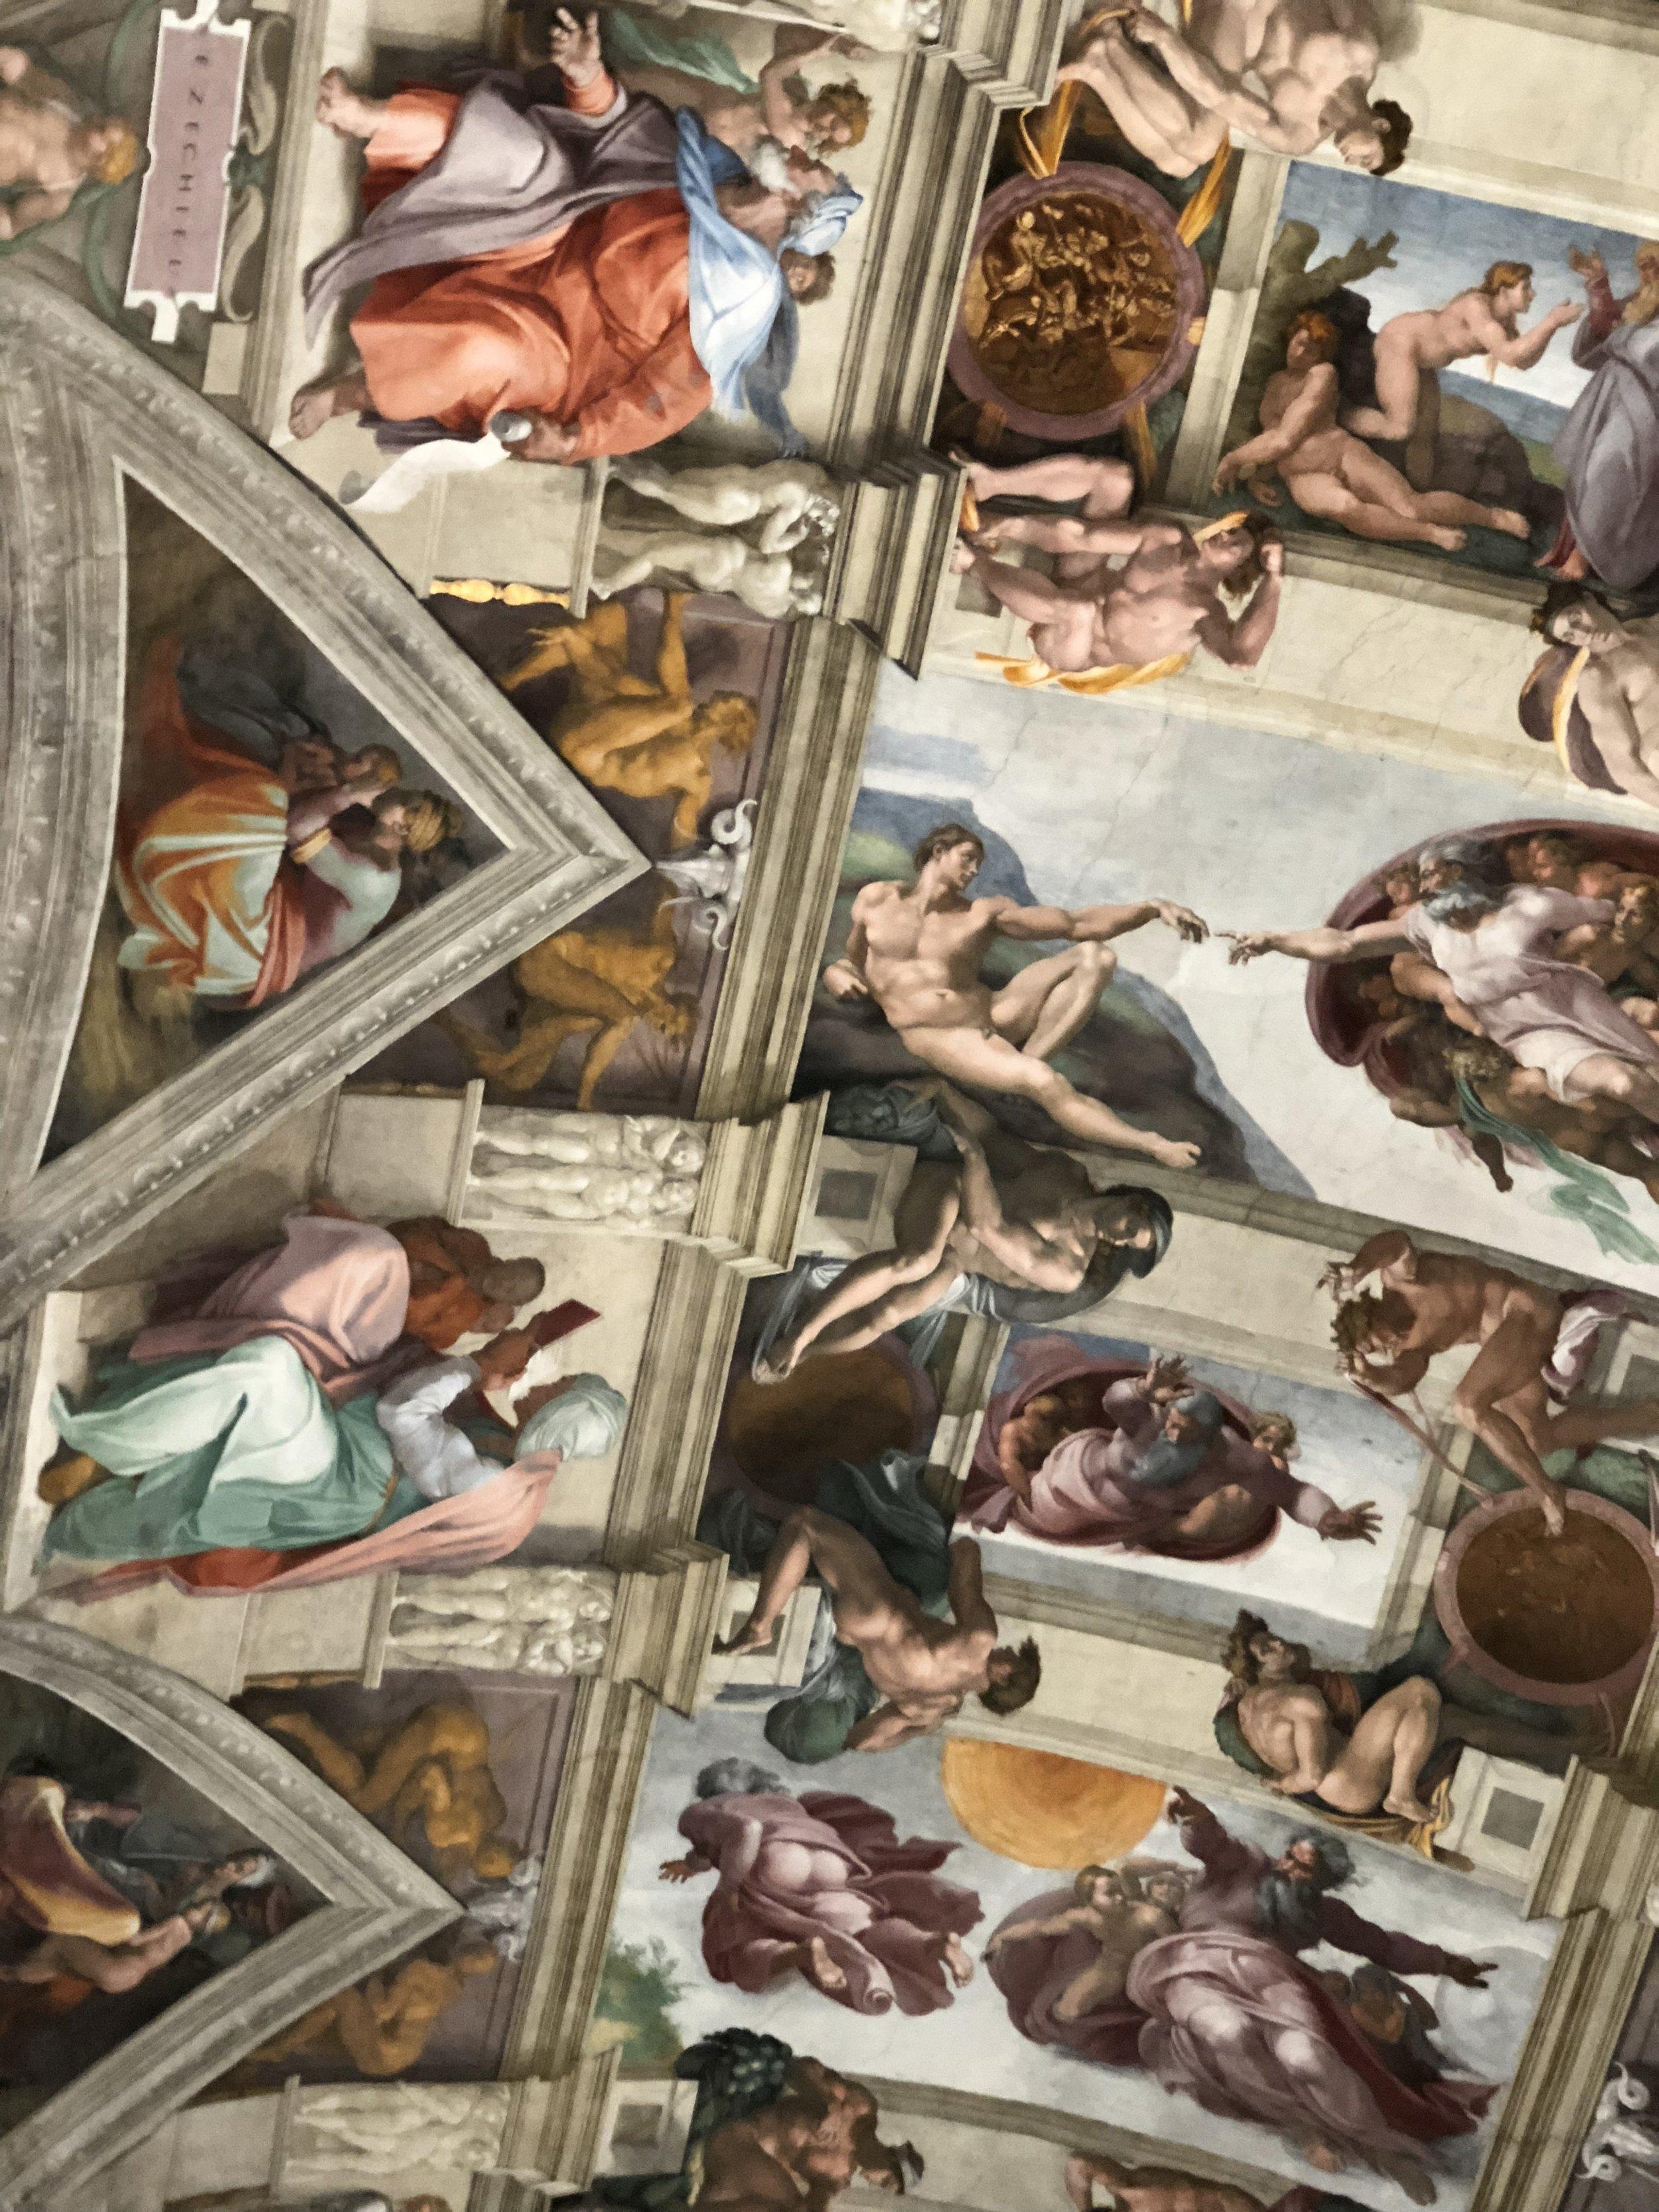 Sistine Chapel, 2017 Rome, Italy.